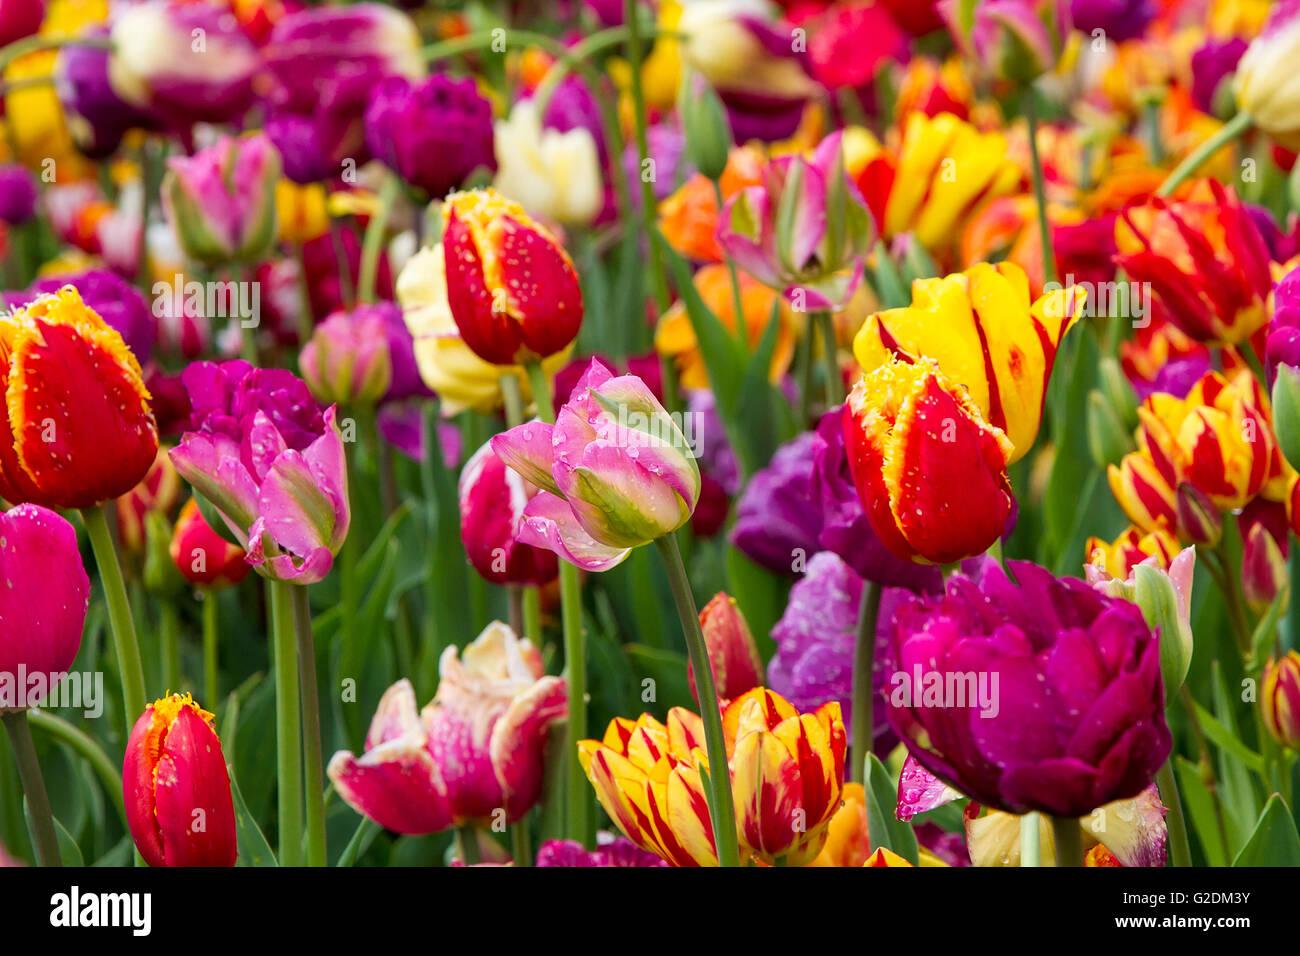 tulpen tulpe blumengarten hintergrund natur rot gr n floral fr hlingsblumen feld bunt rosa gelbe. Black Bedroom Furniture Sets. Home Design Ideas